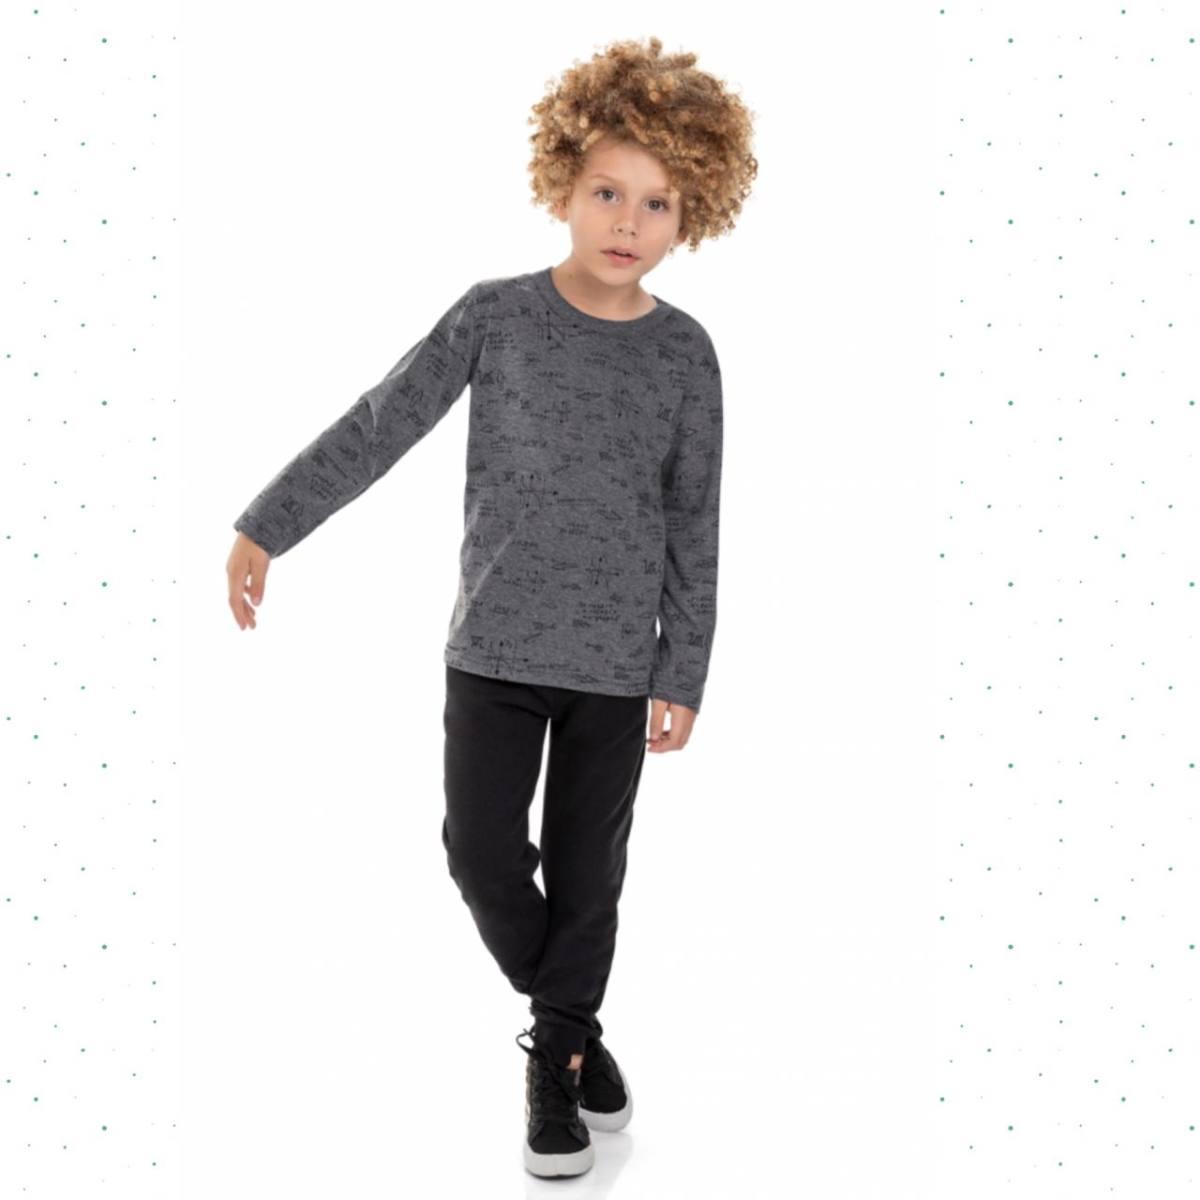 Camiseta Manga Longa Infantil Menino Quimby-Mescla